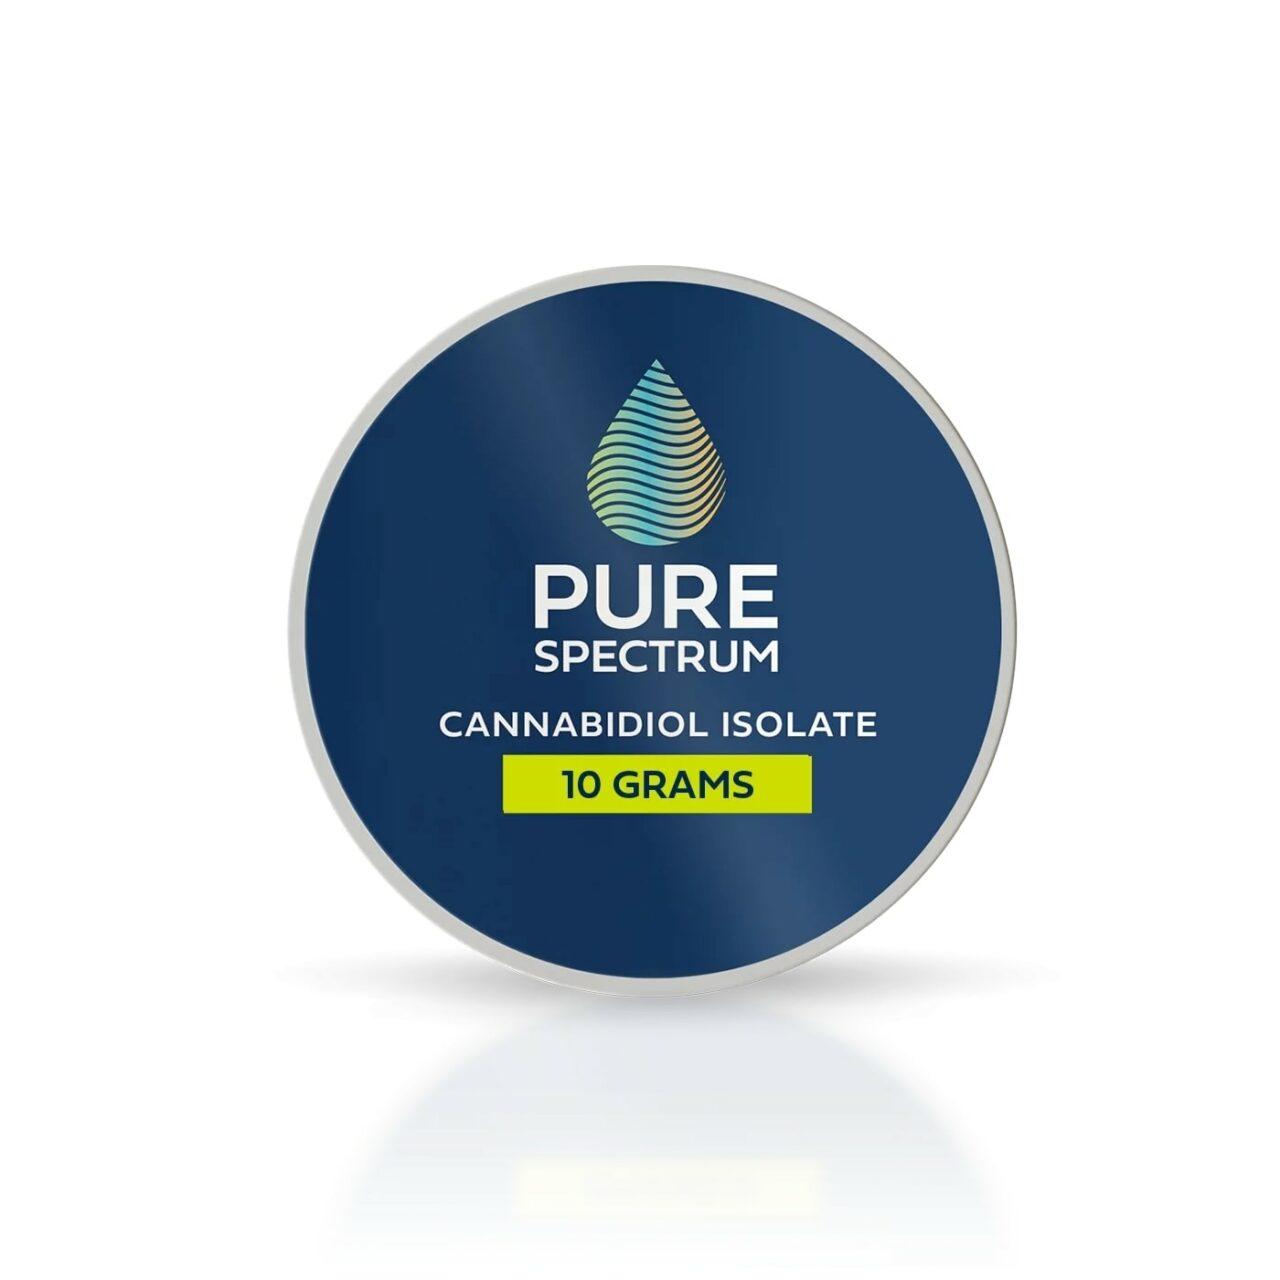 Pure Spectrum, 99% CBD Isolate Powder, 10g, 10000mg of CBD